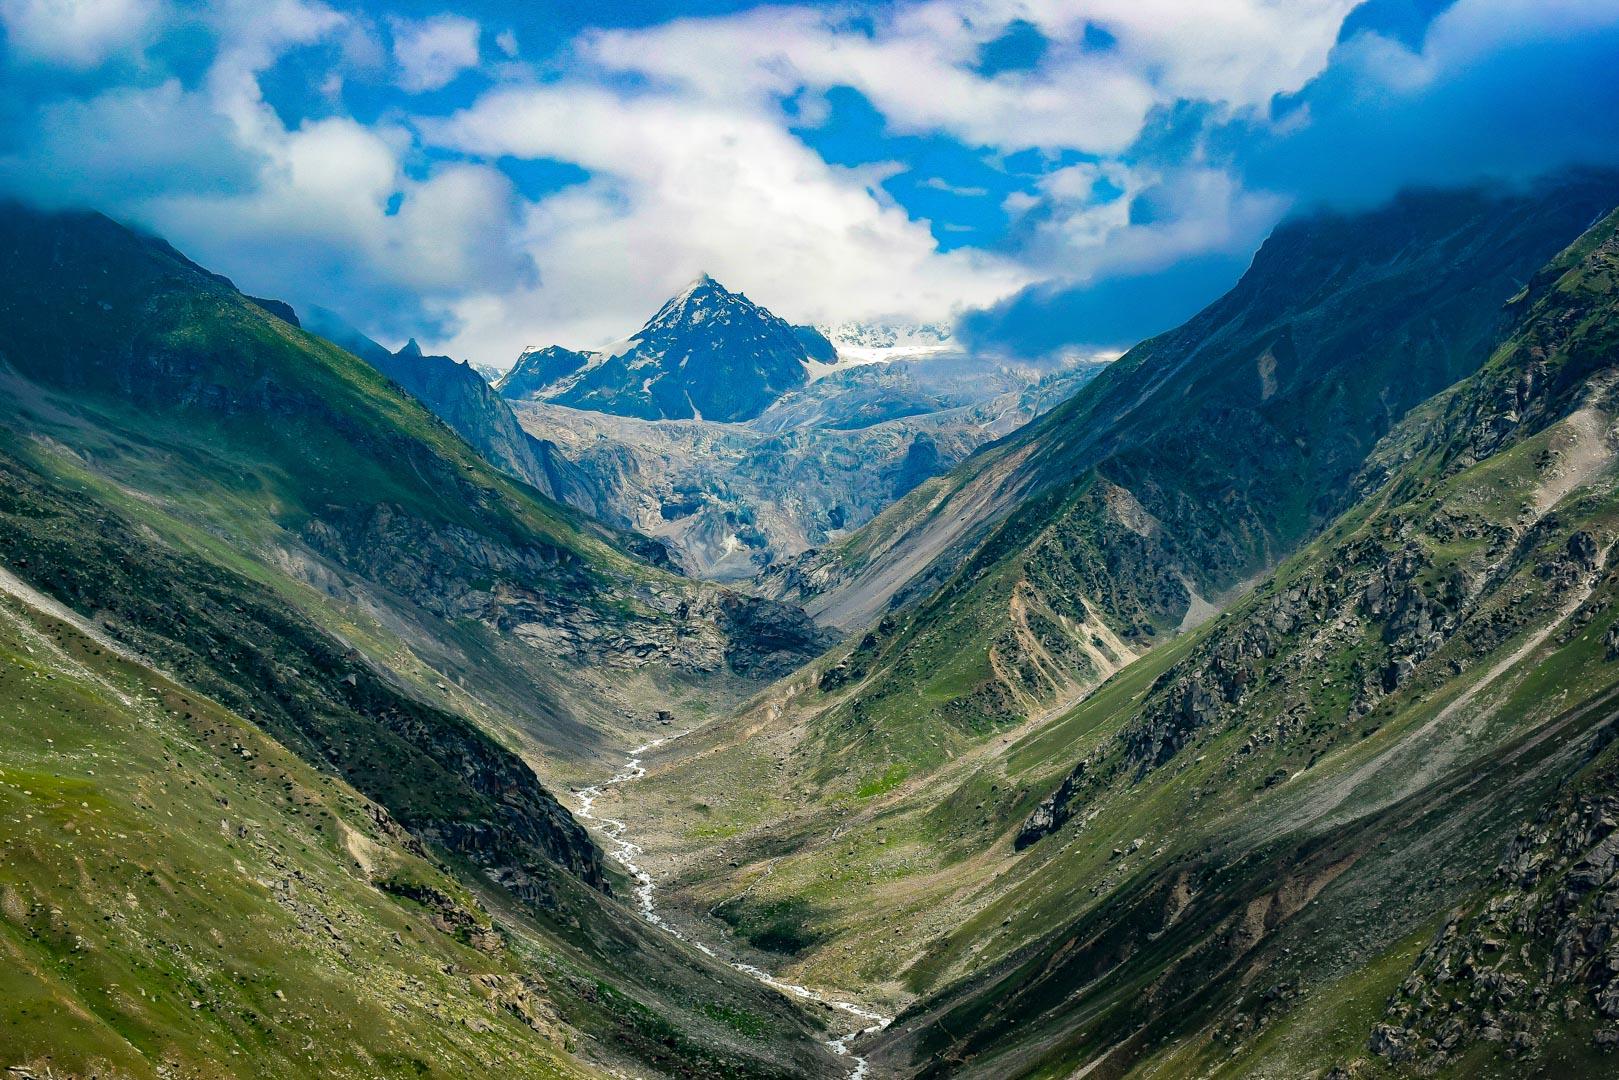 Convenient travel guide for the popular Hampta Pass